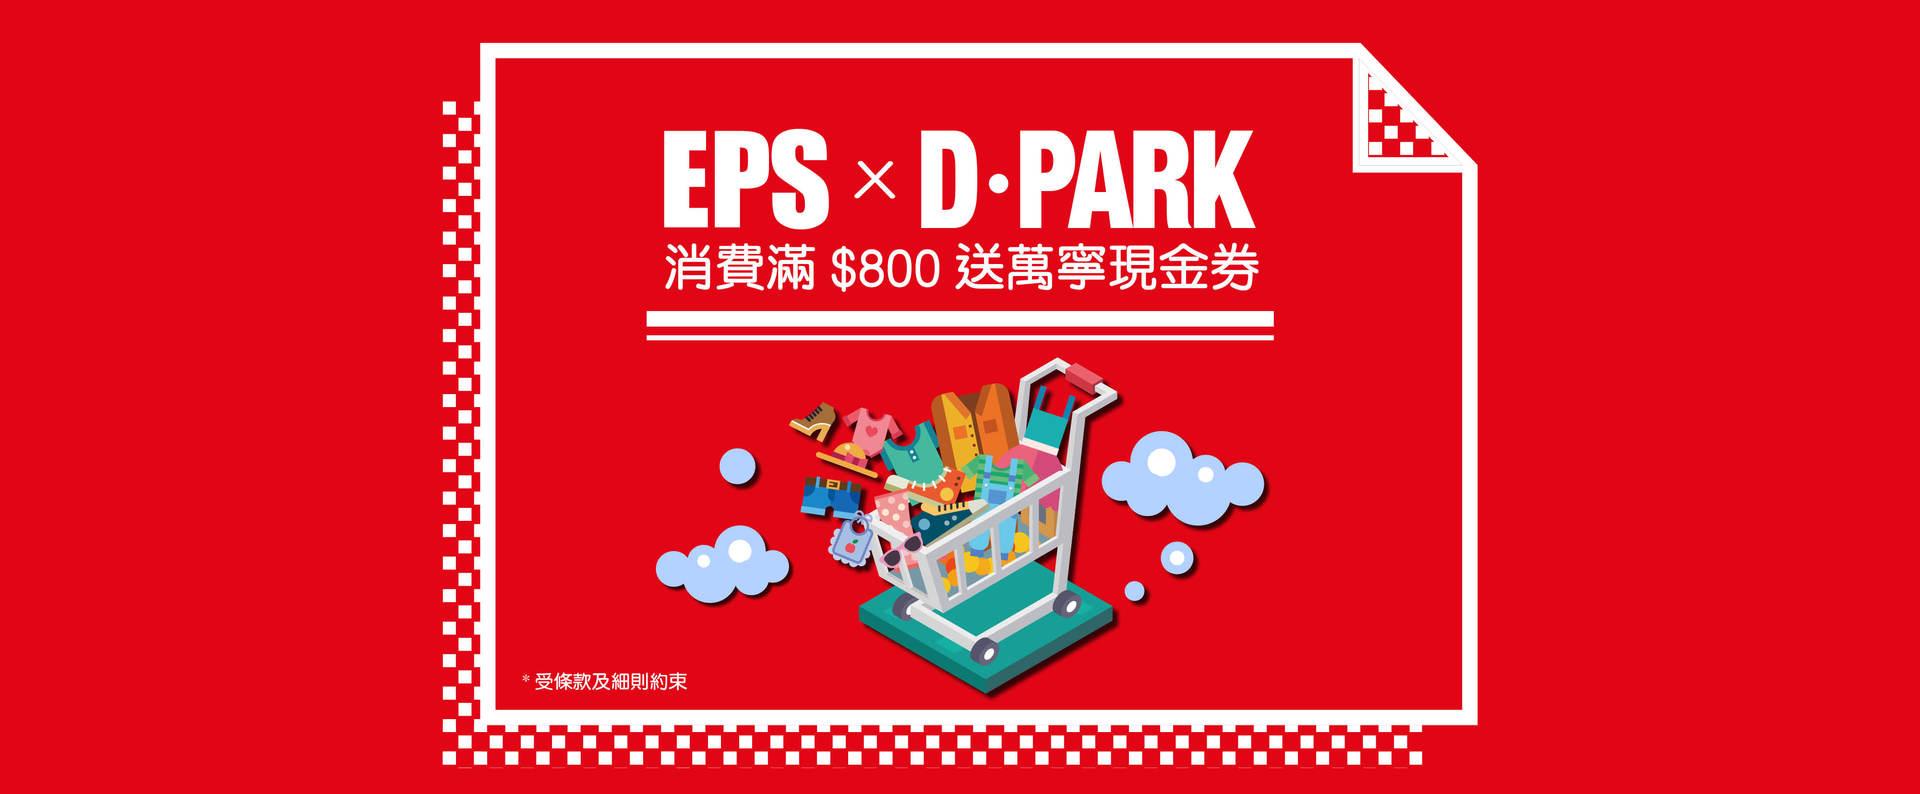 Eps promotion jun2020 web   mobile1920x794 large